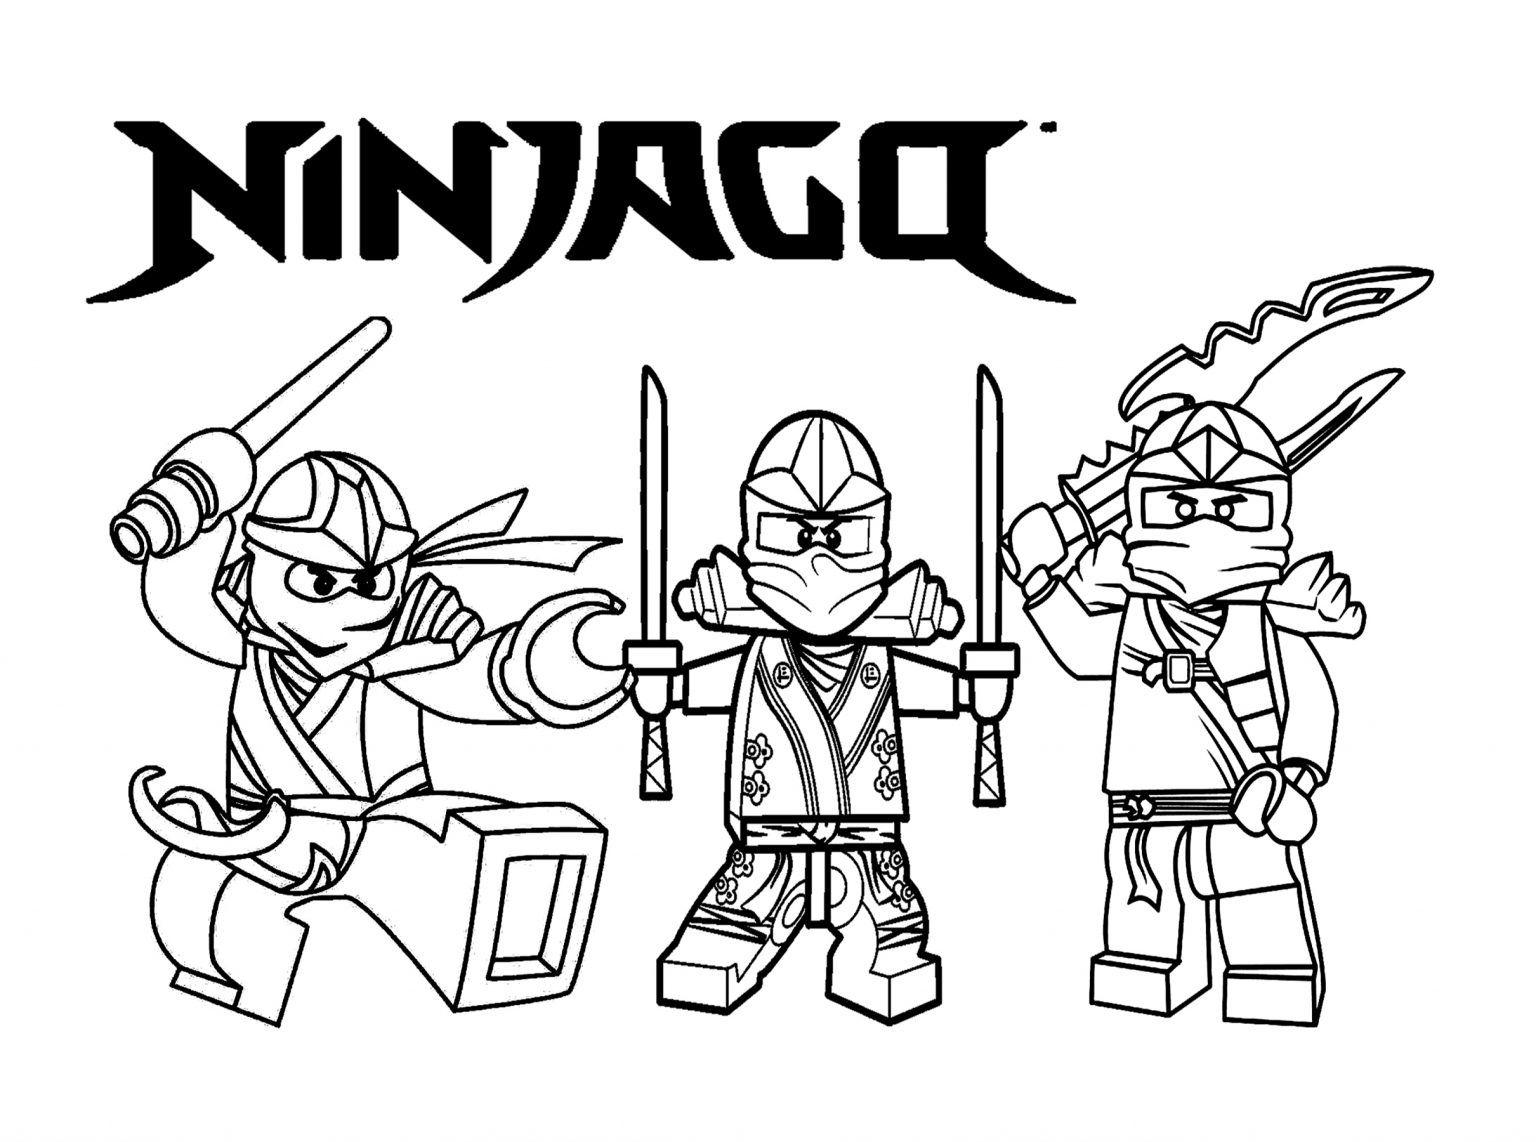 Ninjago Ausmalbilder Kostenlos Malvorlagen Windowcolor Zum innen Ninjago Ausmalbilder Kostenlos Drucken